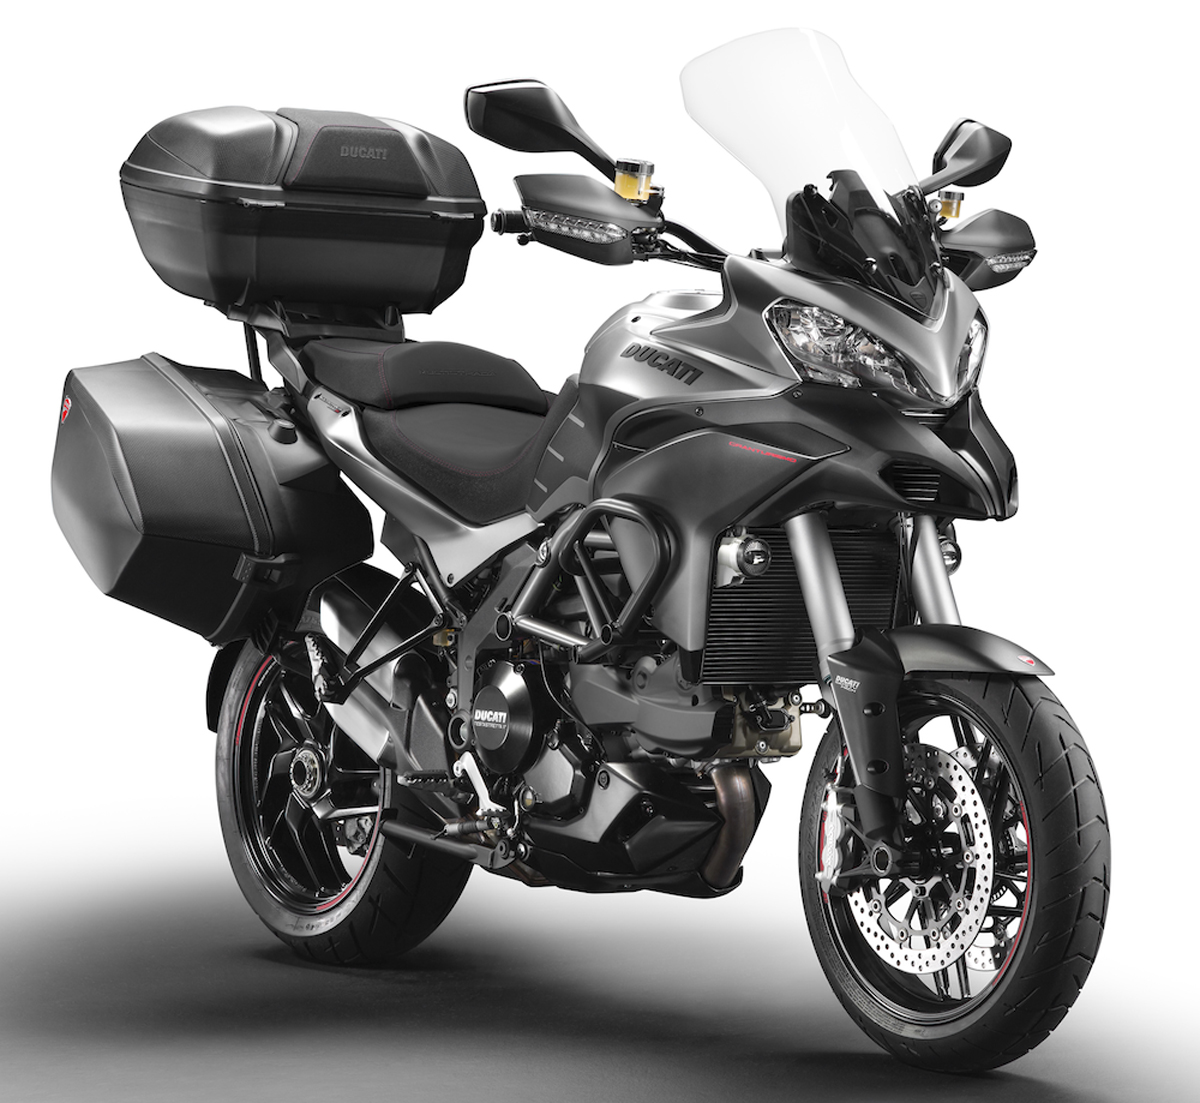 2013 ducati multistrada 1200 latest motorcycle models. Black Bedroom Furniture Sets. Home Design Ideas